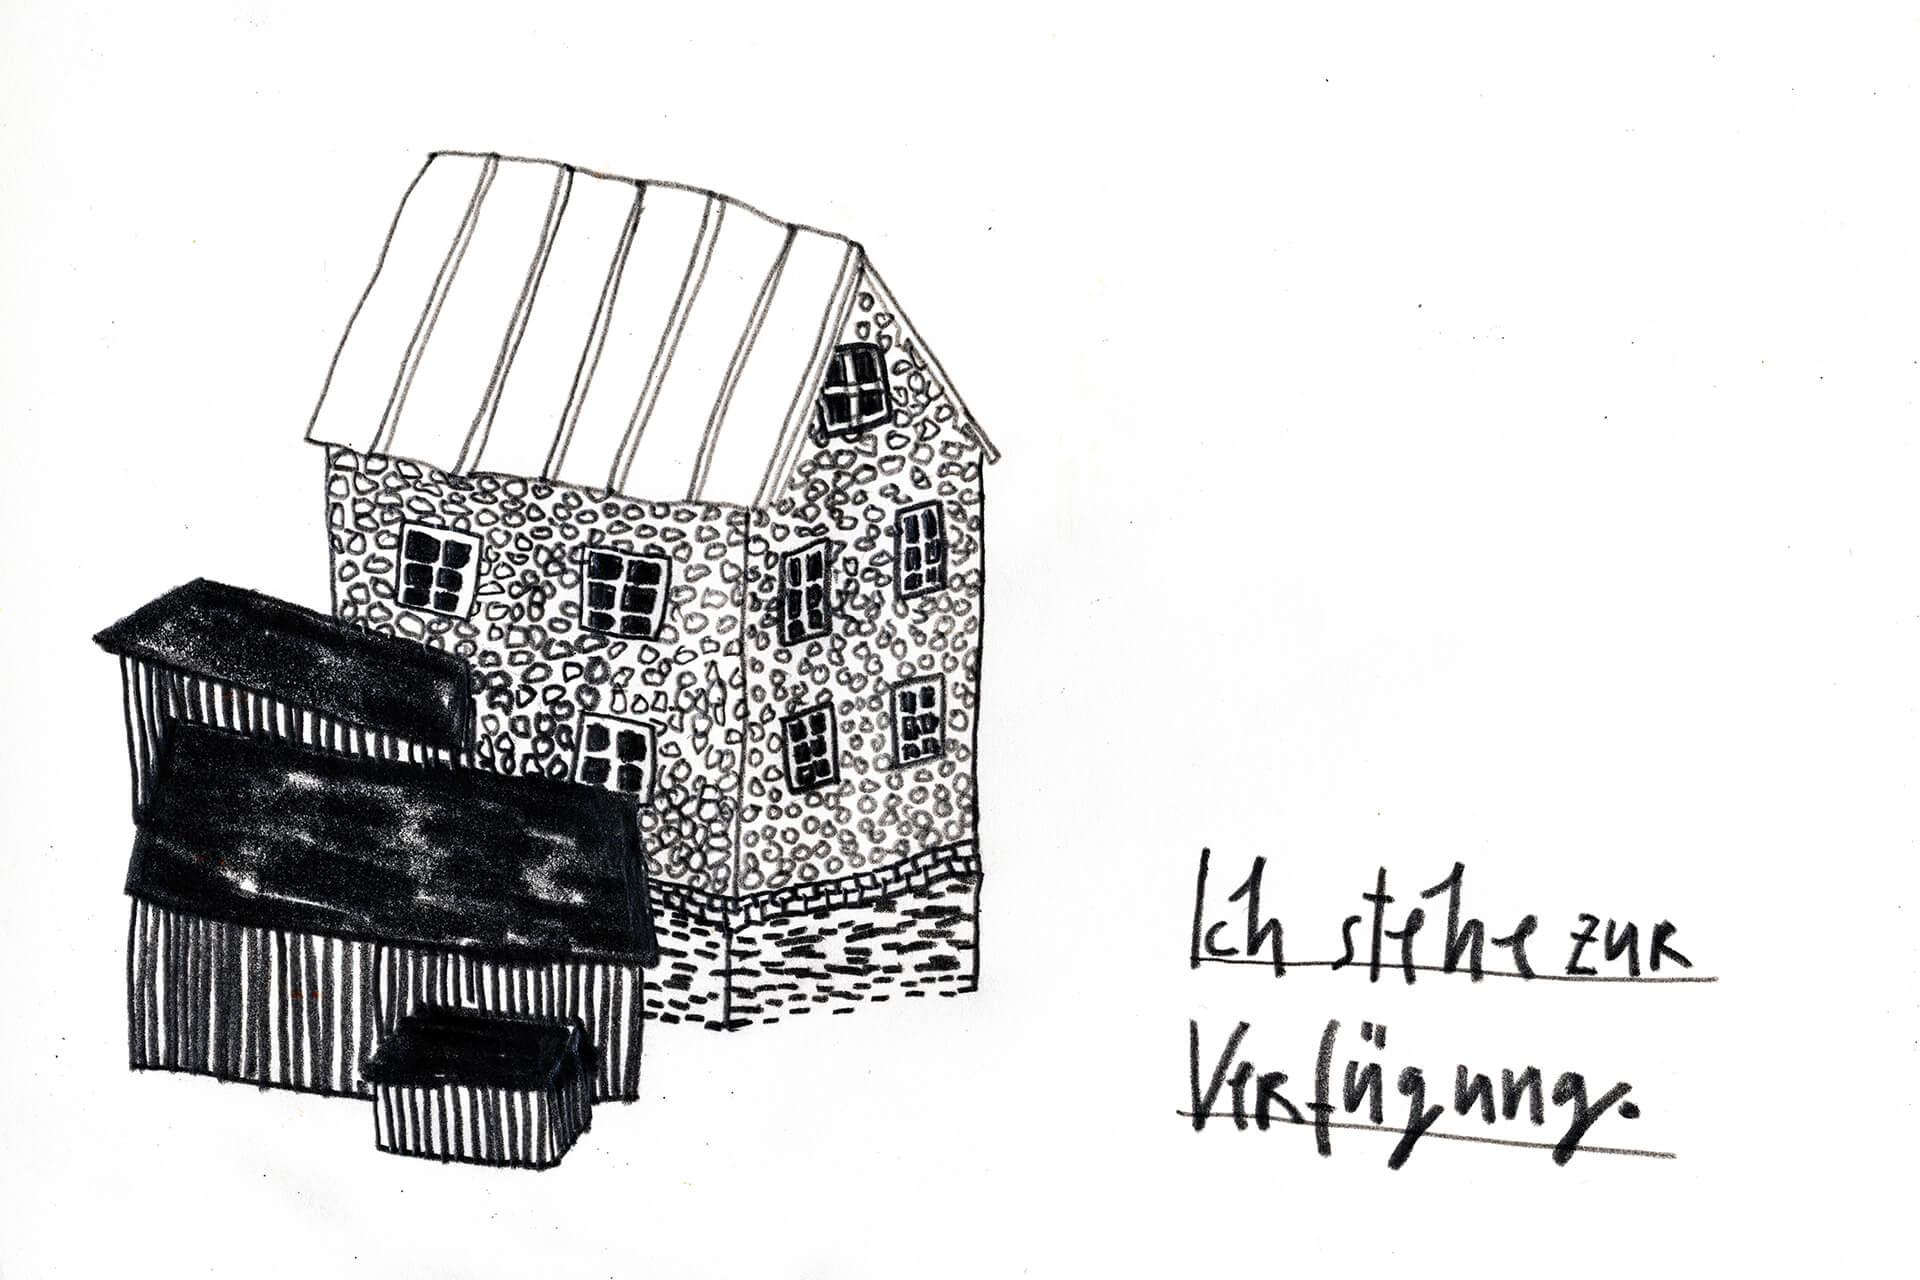 Matrosenhunde, Wochenkalender, Illustration Berlin, text, handlettering, Handschrift, Haus, Häuser, Heim, house, home, Landleben, country life, Hygge, hyggelig, zeichnung